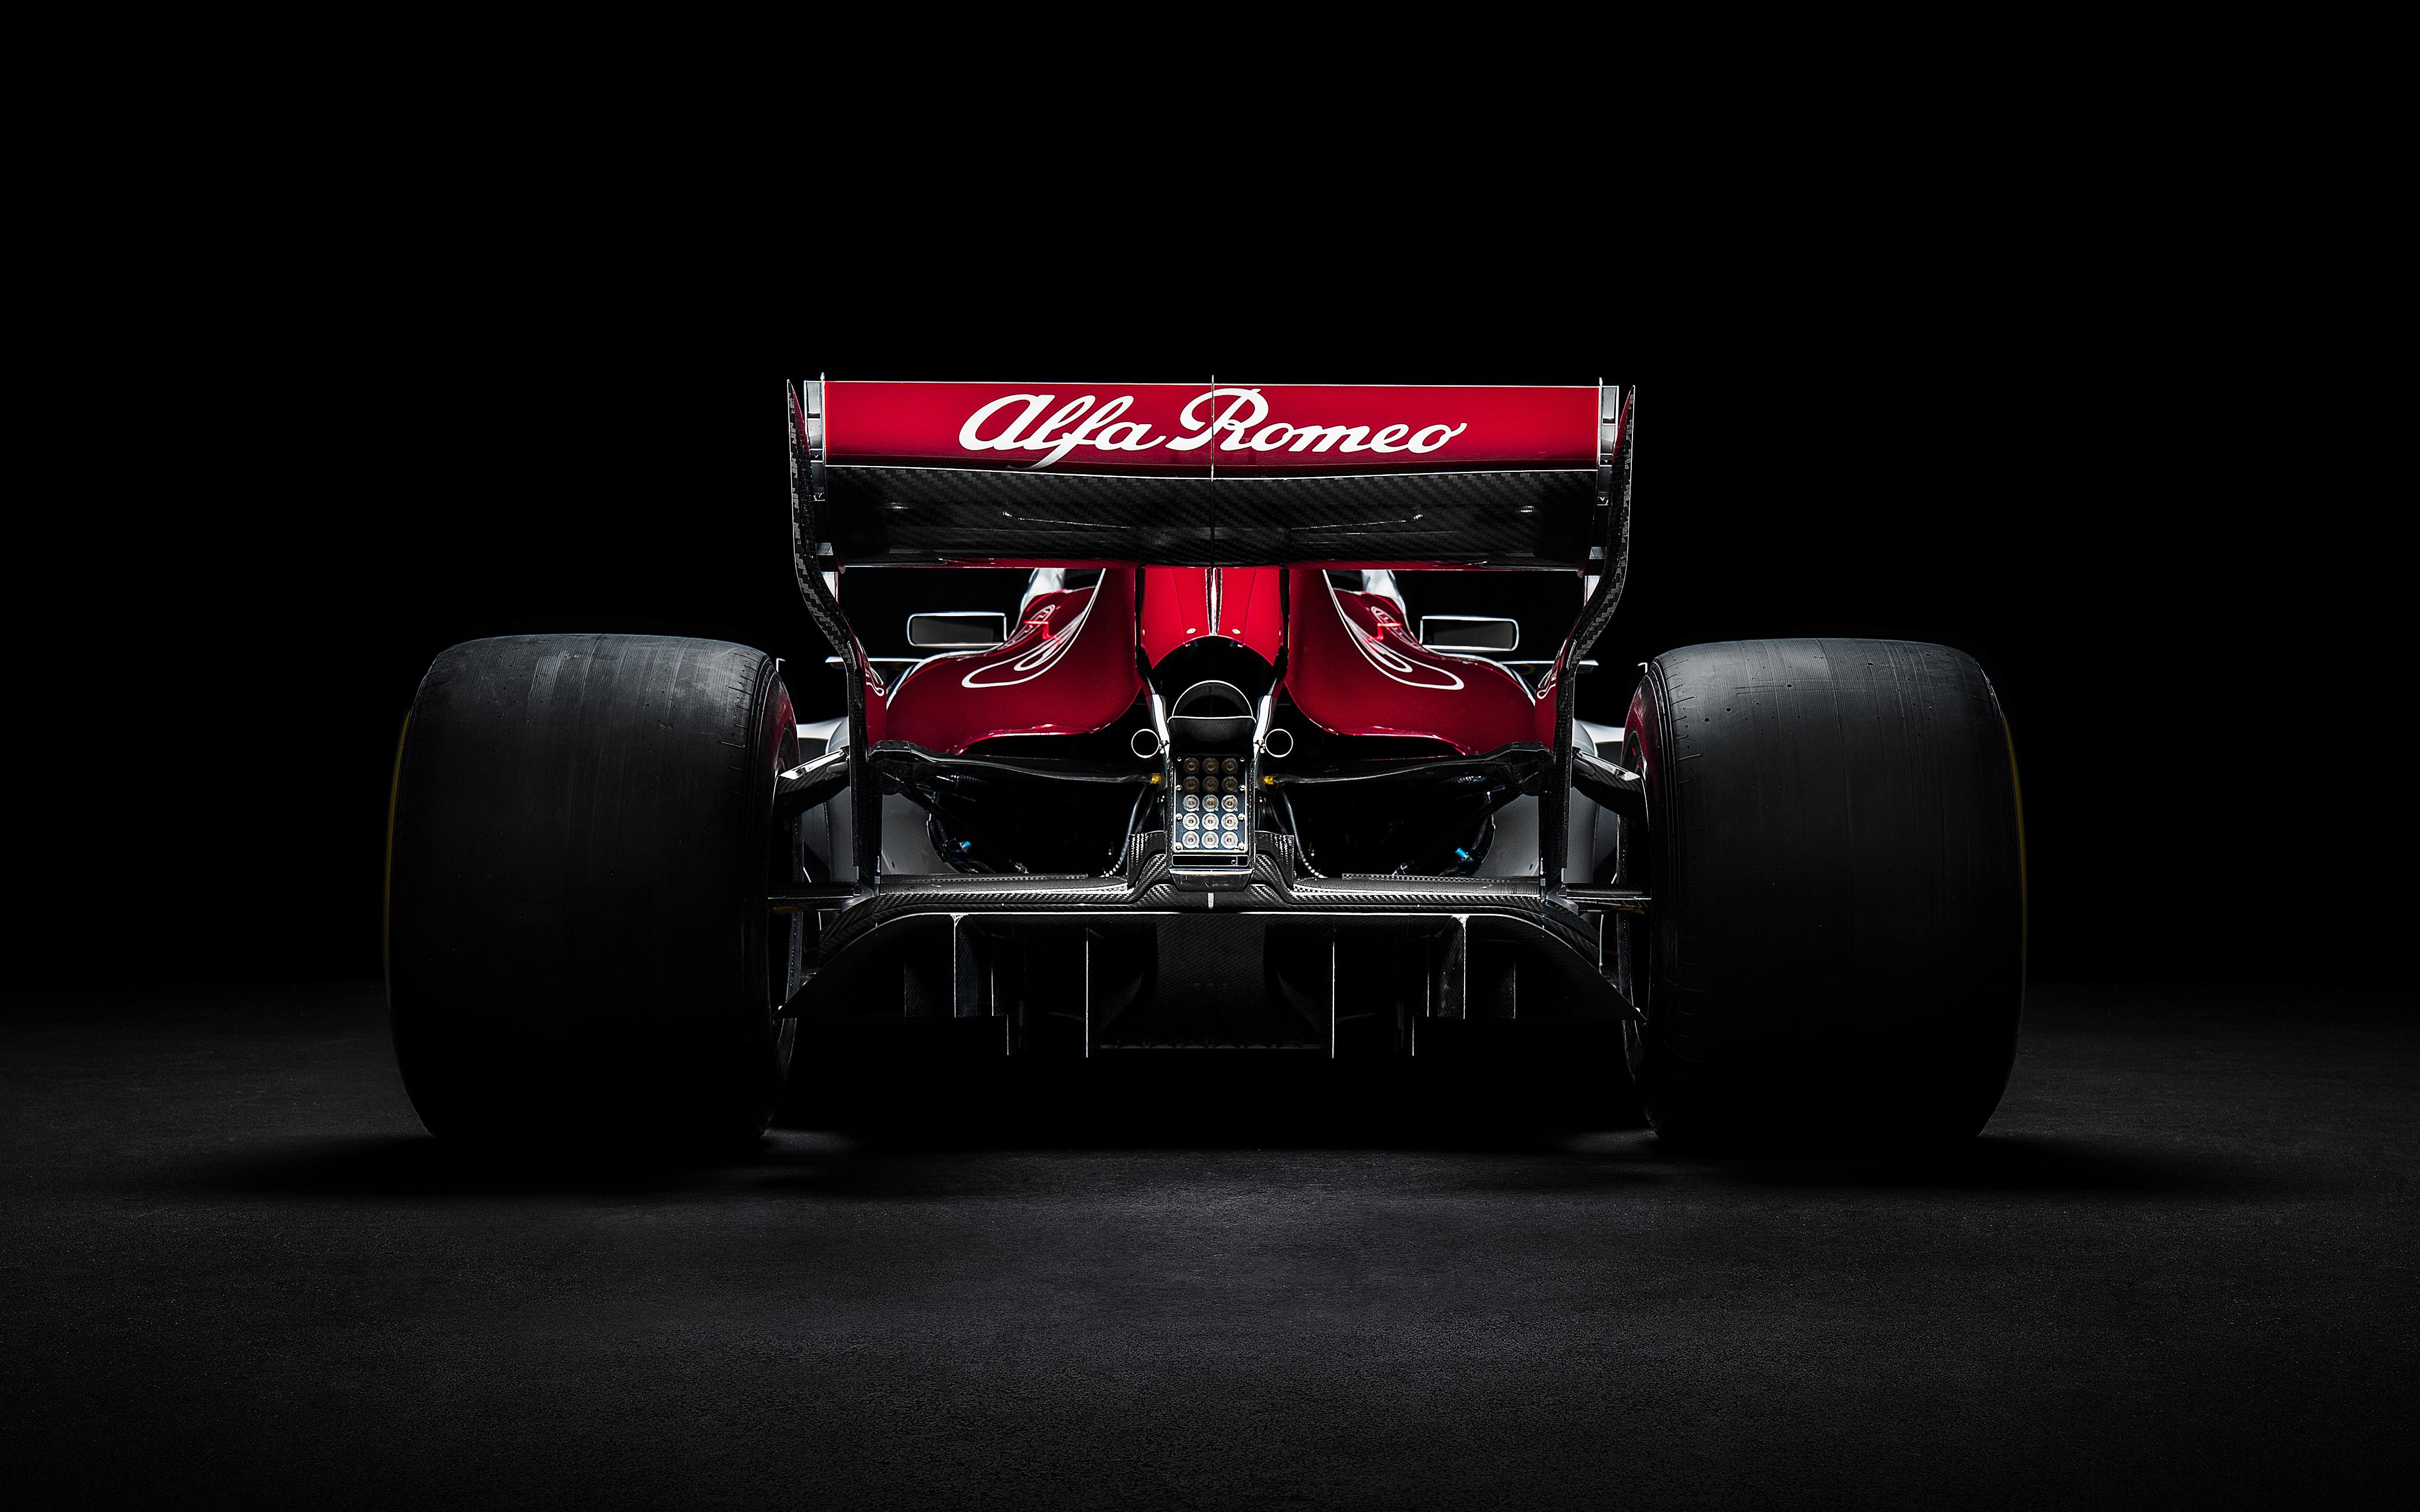 Alfa Romeo Wallpaper 5   4096 X 2560 stmednet 4096x2560